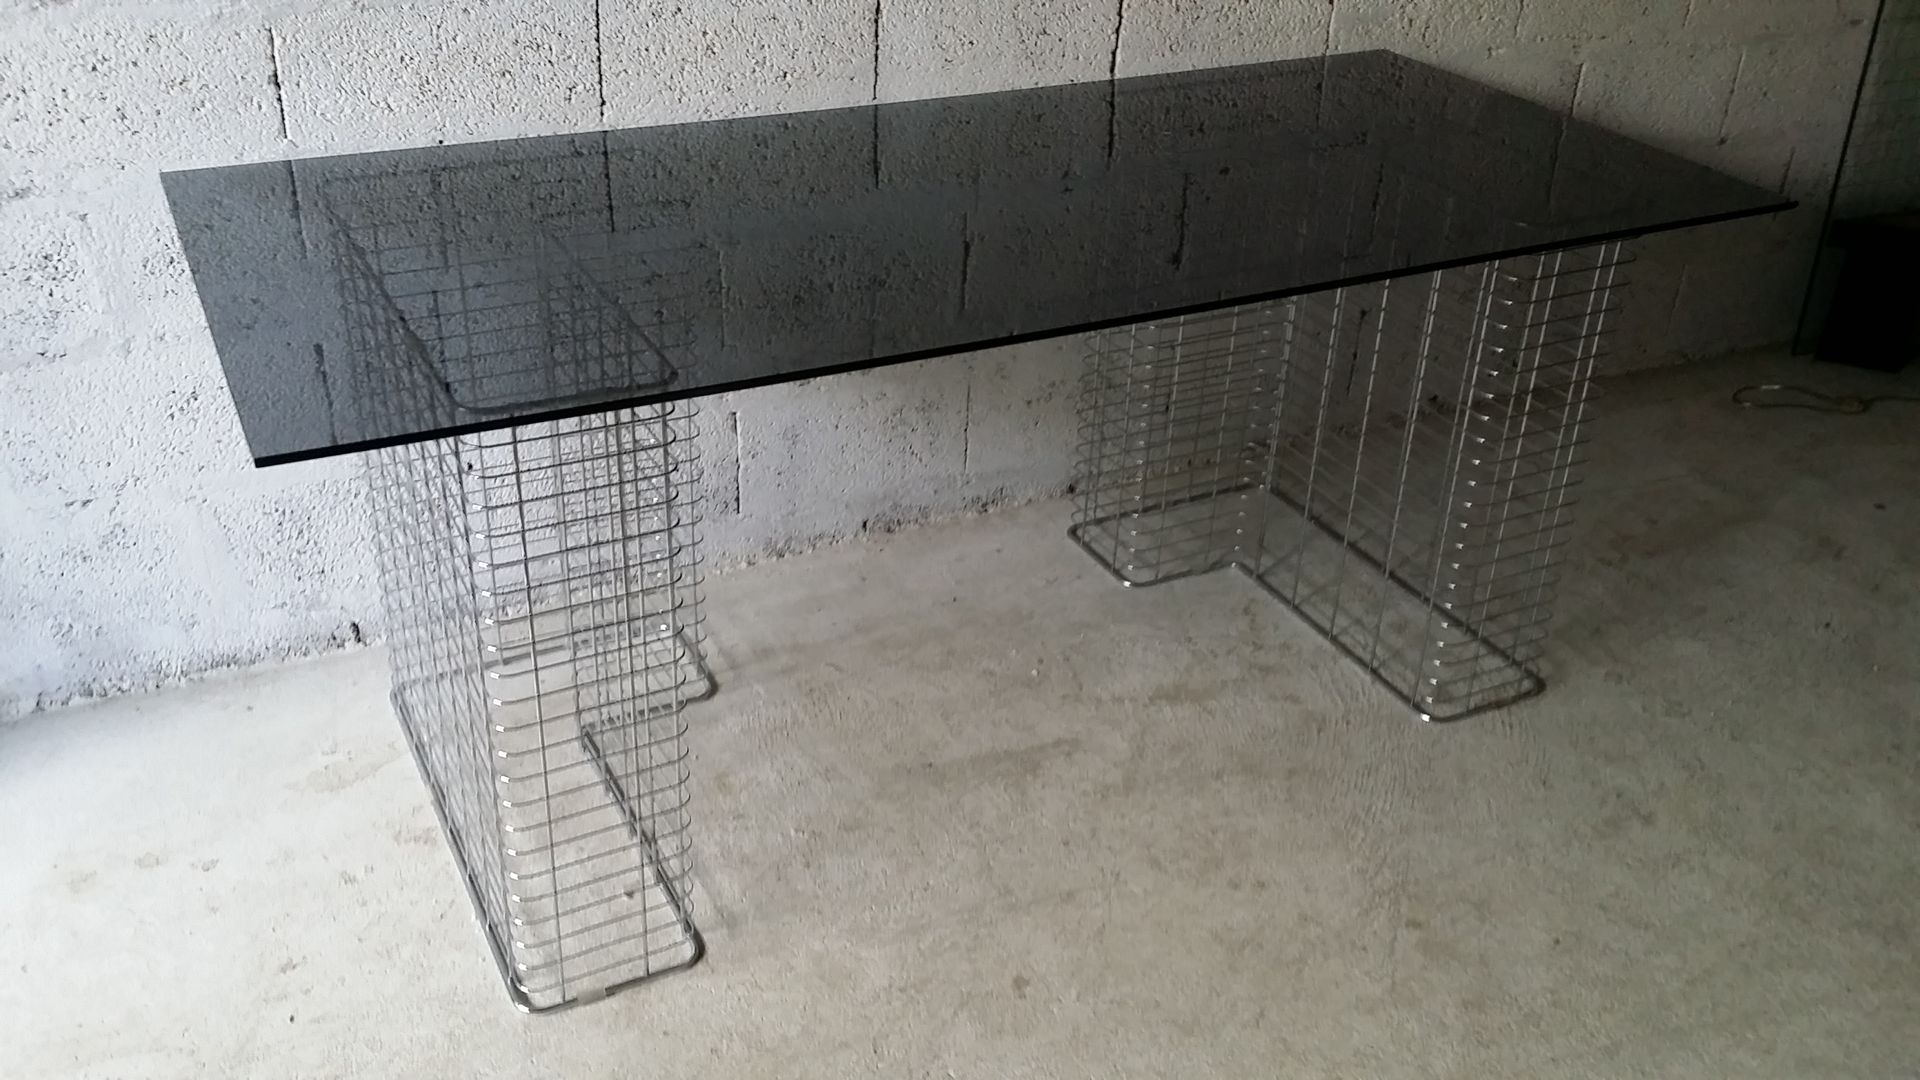 Magasin Habitat Et Jardin Meilleur De Galerie Chaise De Bureau Habitat Centralillaw